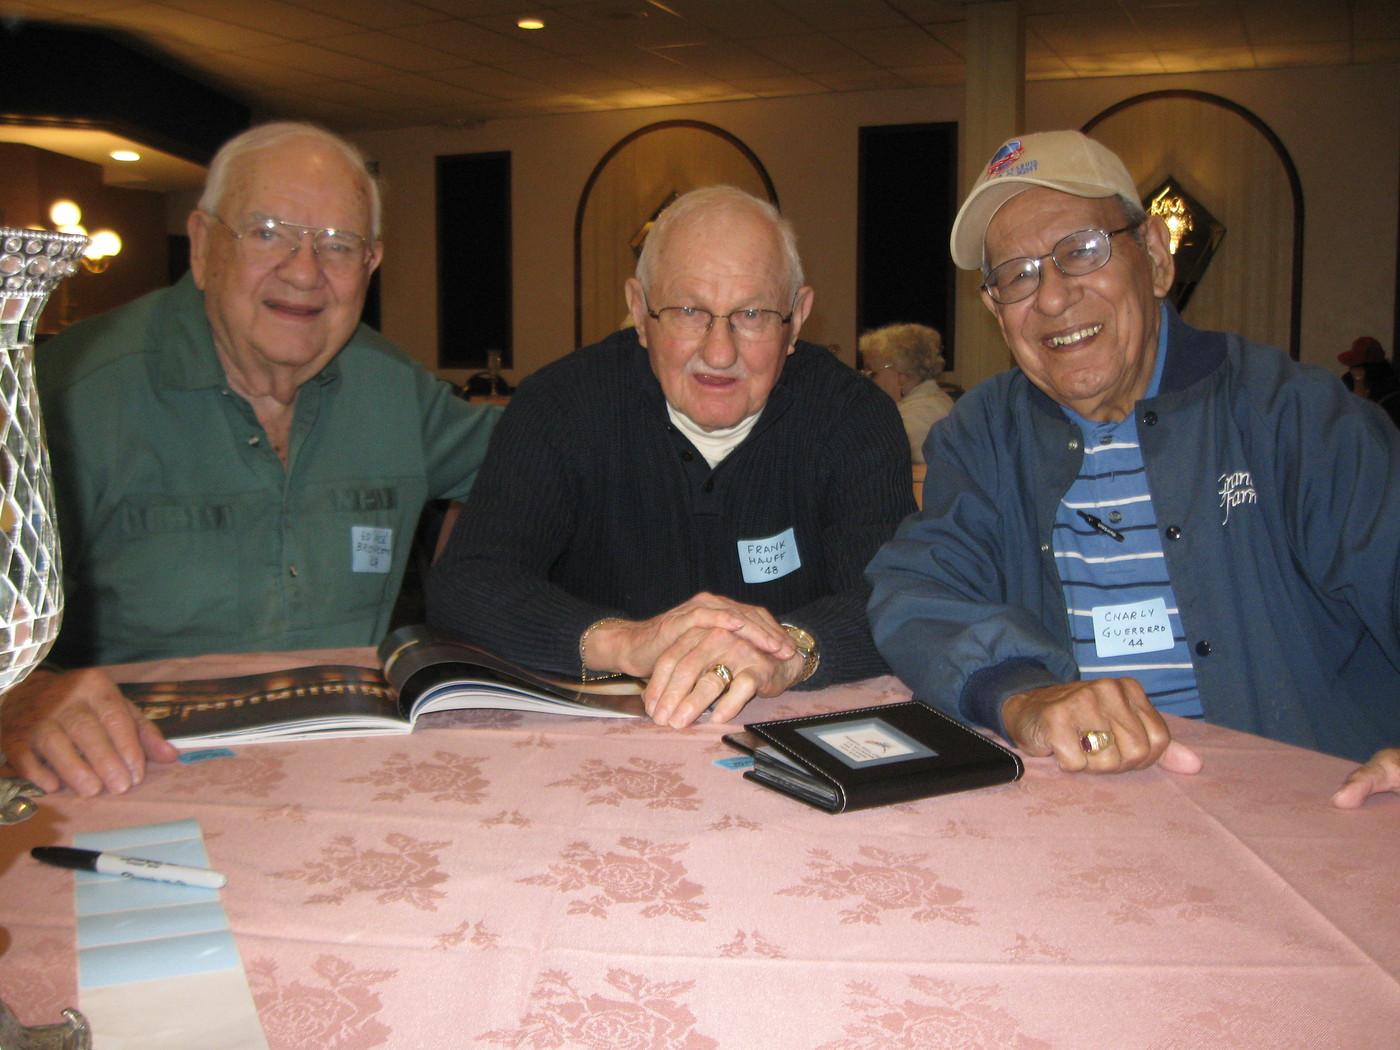 Ed Bronczyk, Frank Hauff, Chas Guerrero